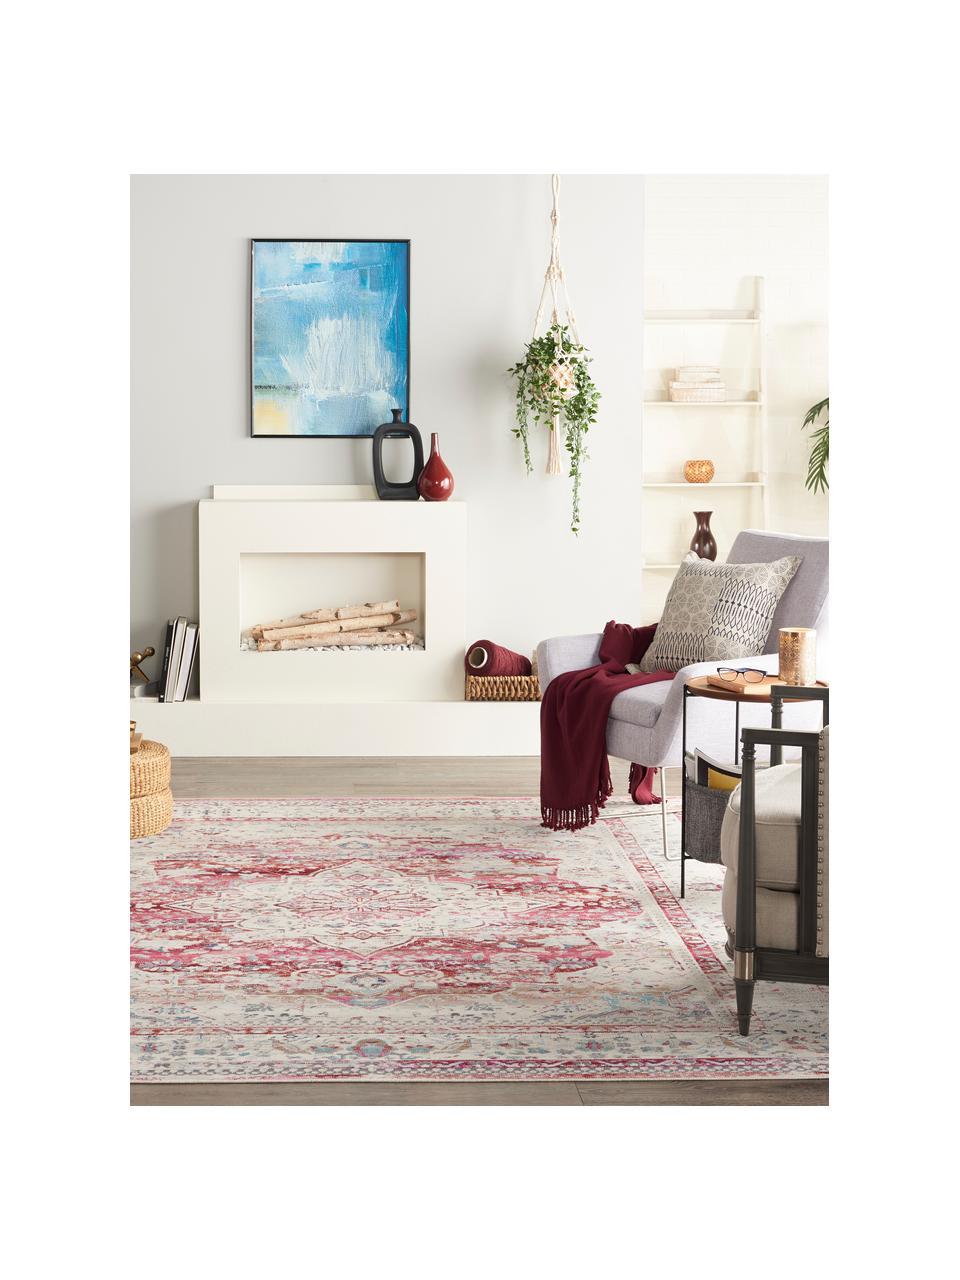 Teppich Vintage Kashan mit Vintagemuster, Flor: 100% Polypropylen, Beige, Rot, Blau, B 240 x L 300 cm (Größe L)